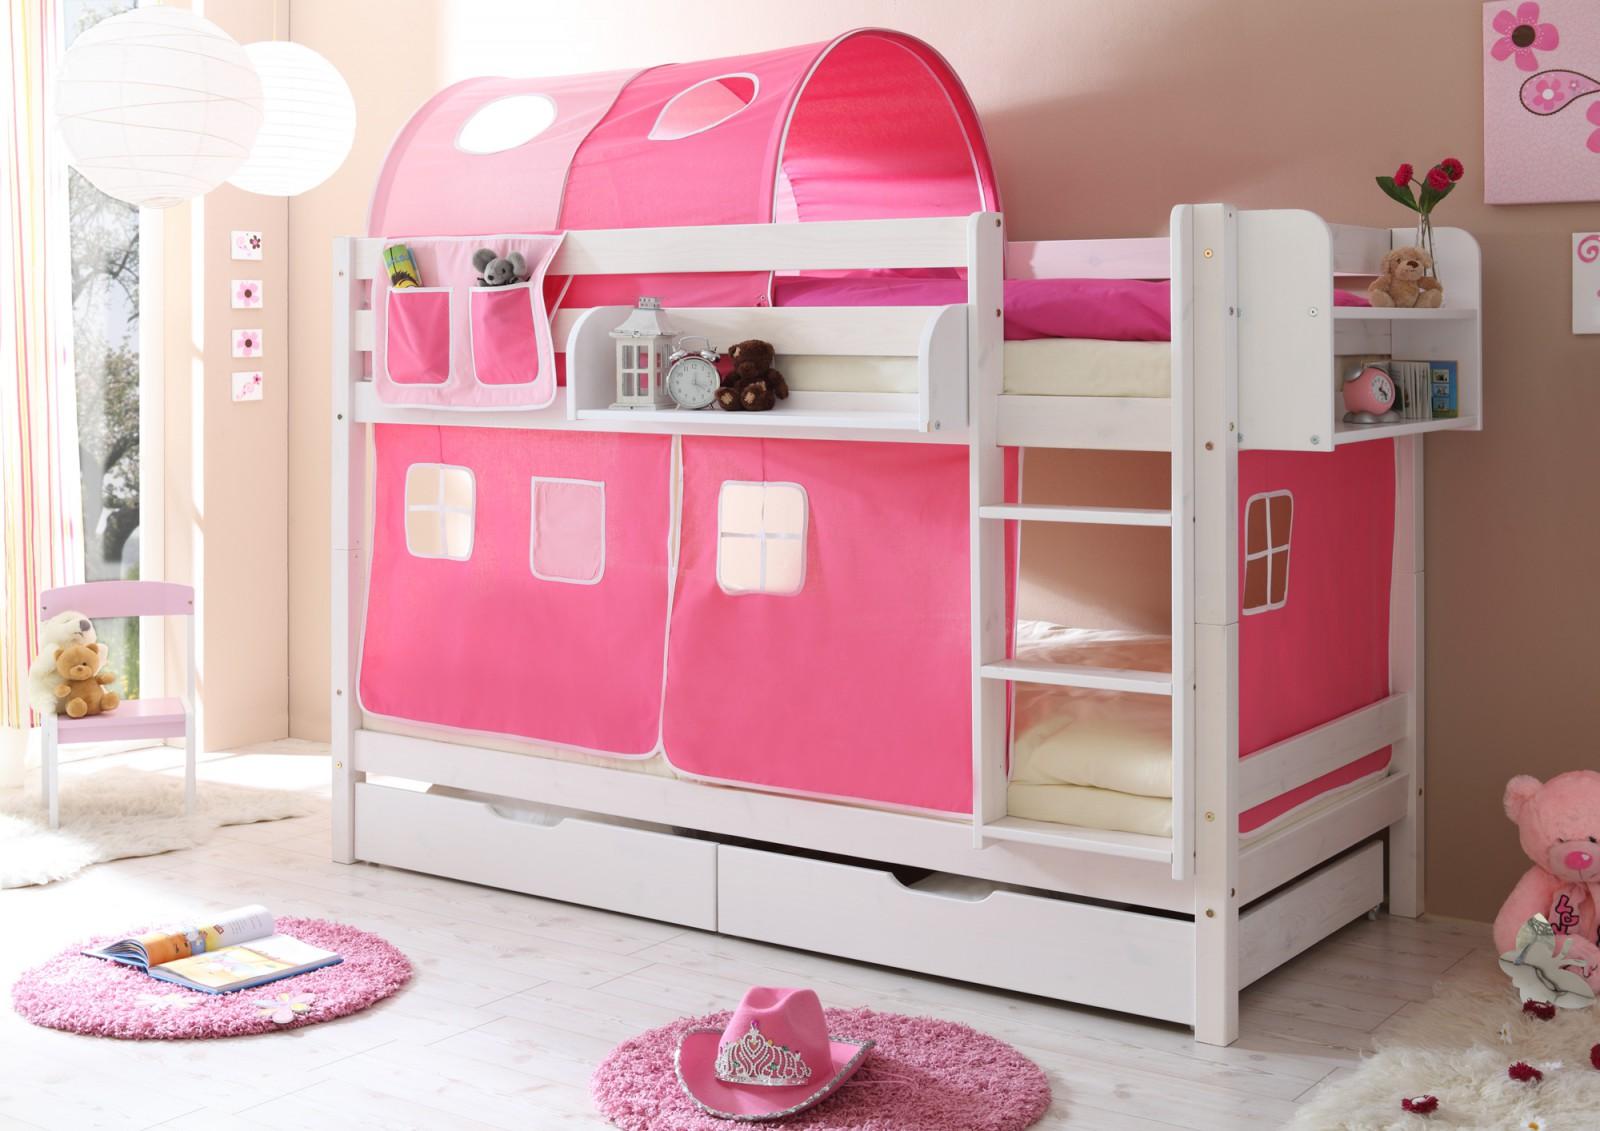 Etagenbett  Marcel  Kiefer weiß  rosa-pink